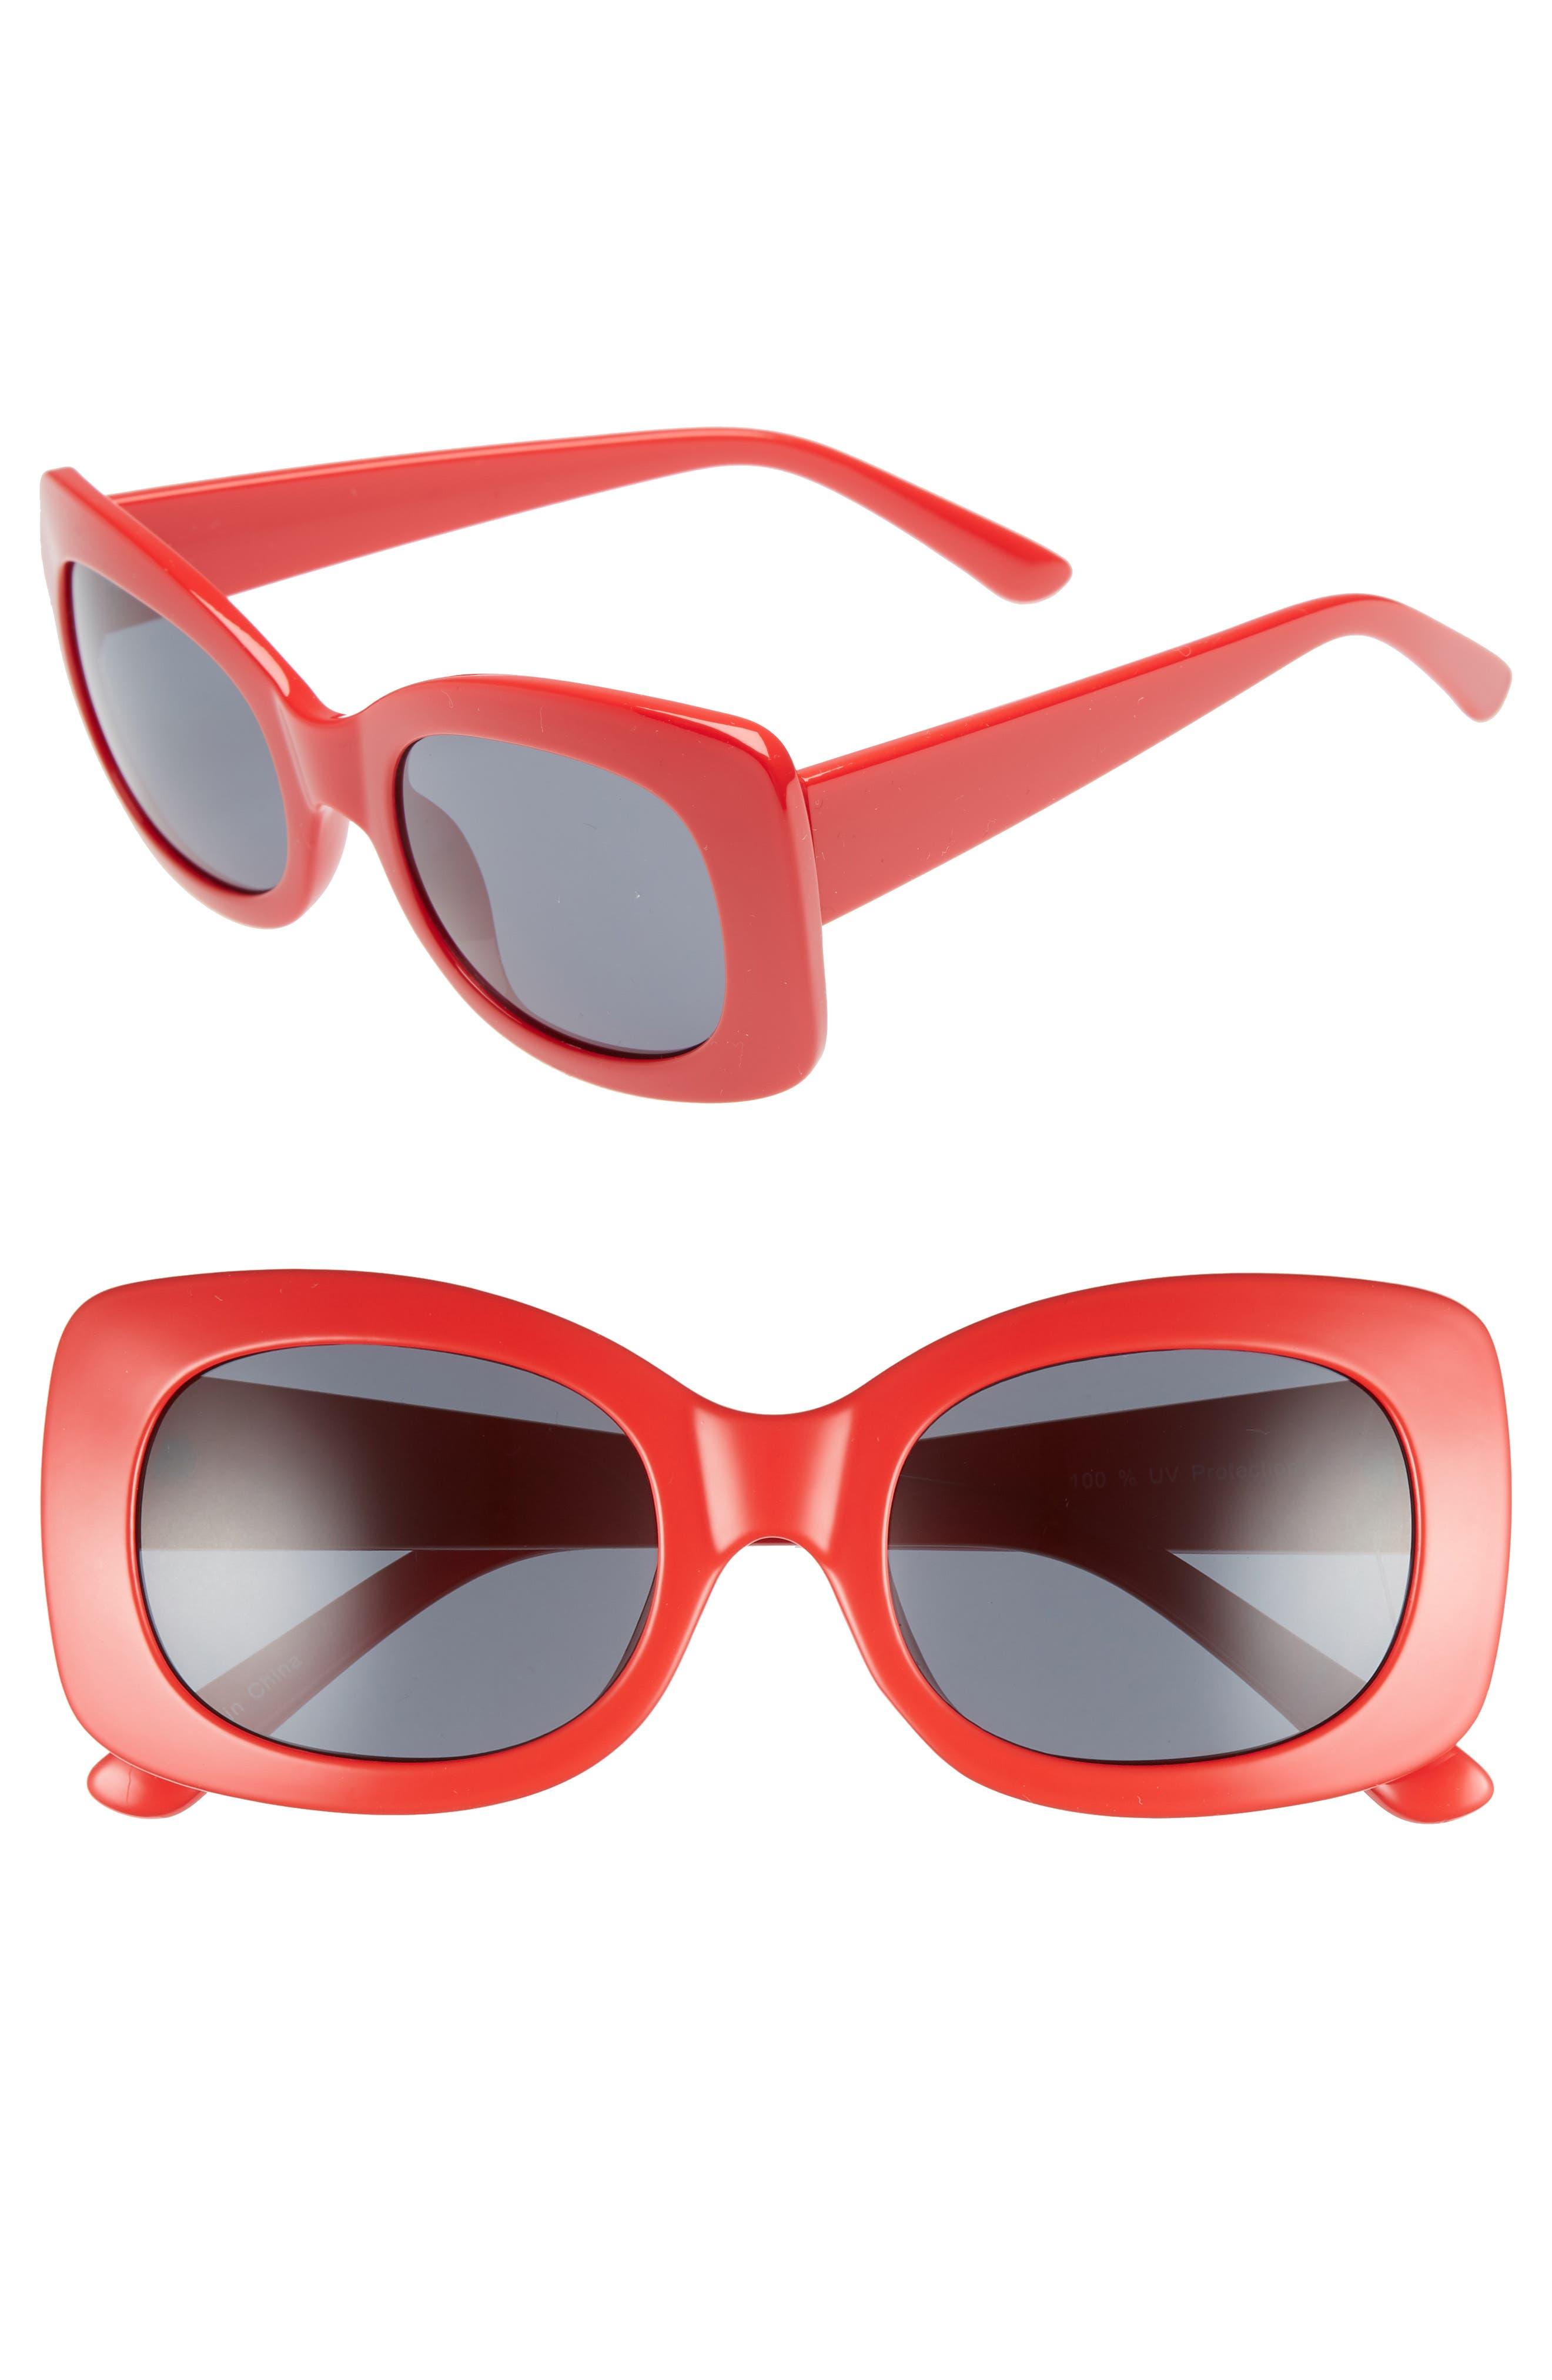 51mm Square Sunglasses,                         Main,                         color, Red/ Black